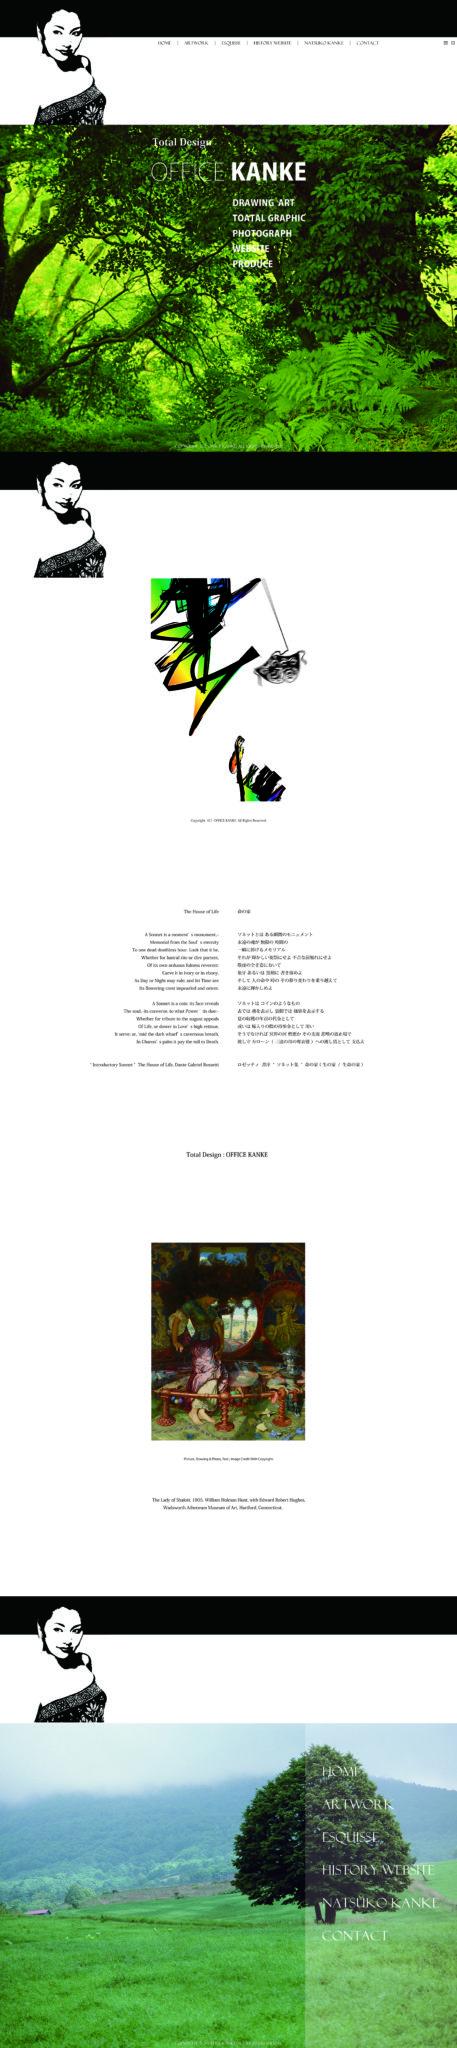 print_base_plan_office_kanke_2019